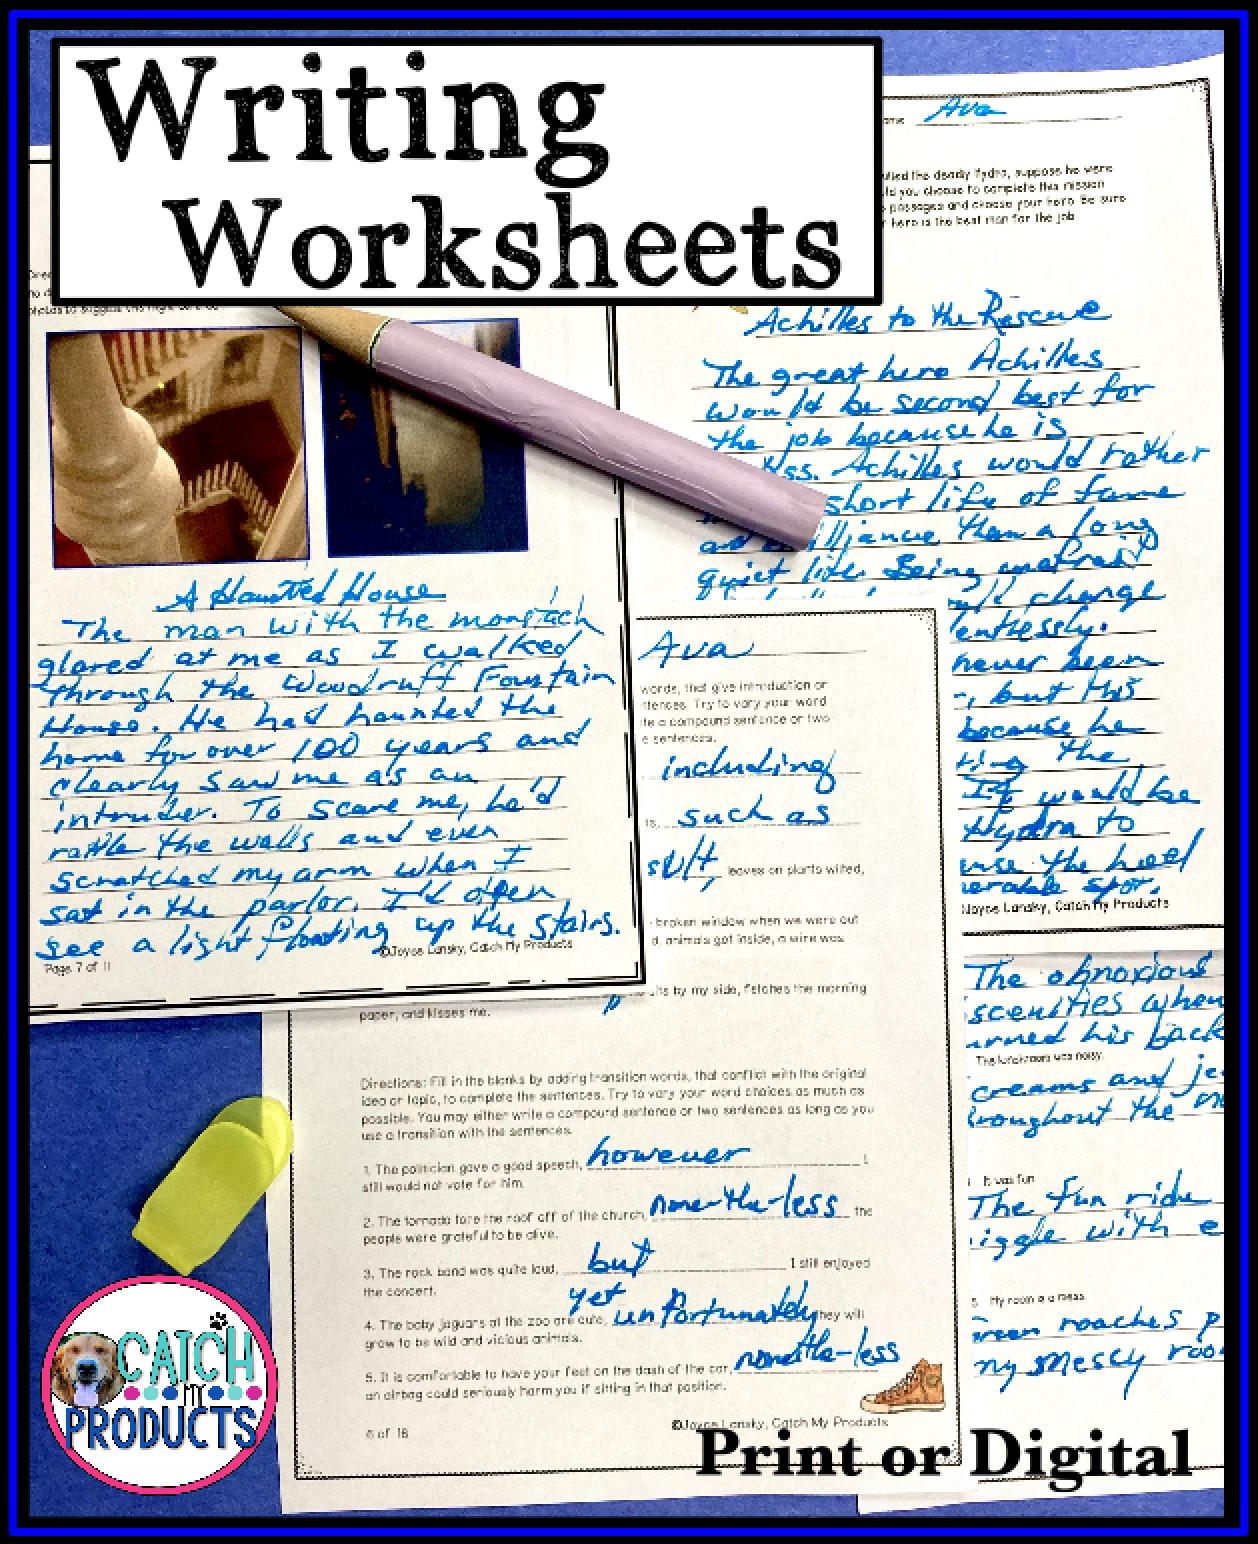 Virtual Writing Practice Print Or Digital Writing Worksheets In 2021 Teaching Writing Elementary Writing Practice Digital Writing [ 1544 x 1258 Pixel ]